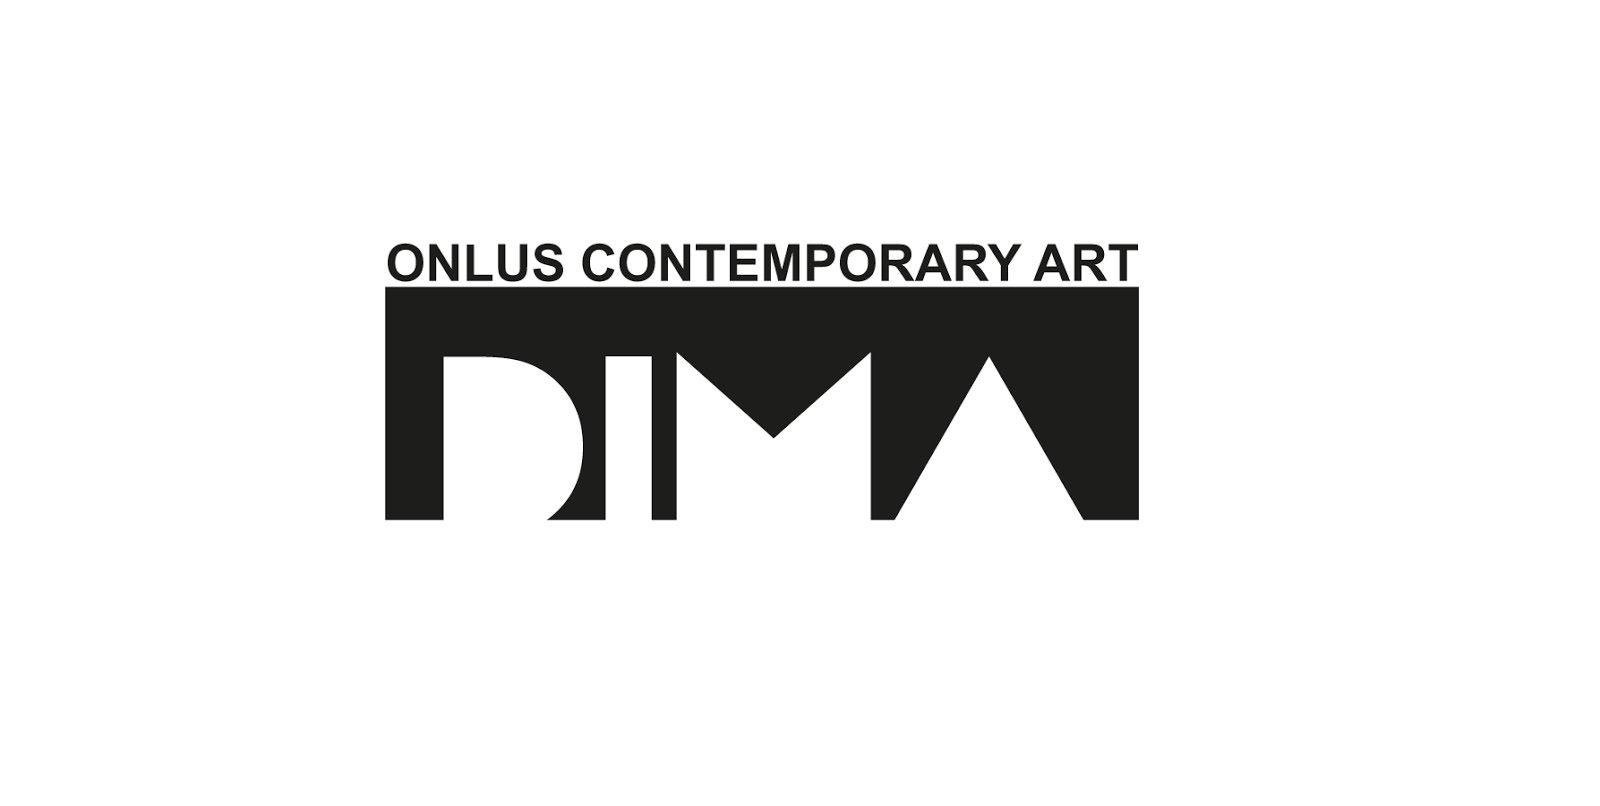 DIMA Contemporary Art - Onlus